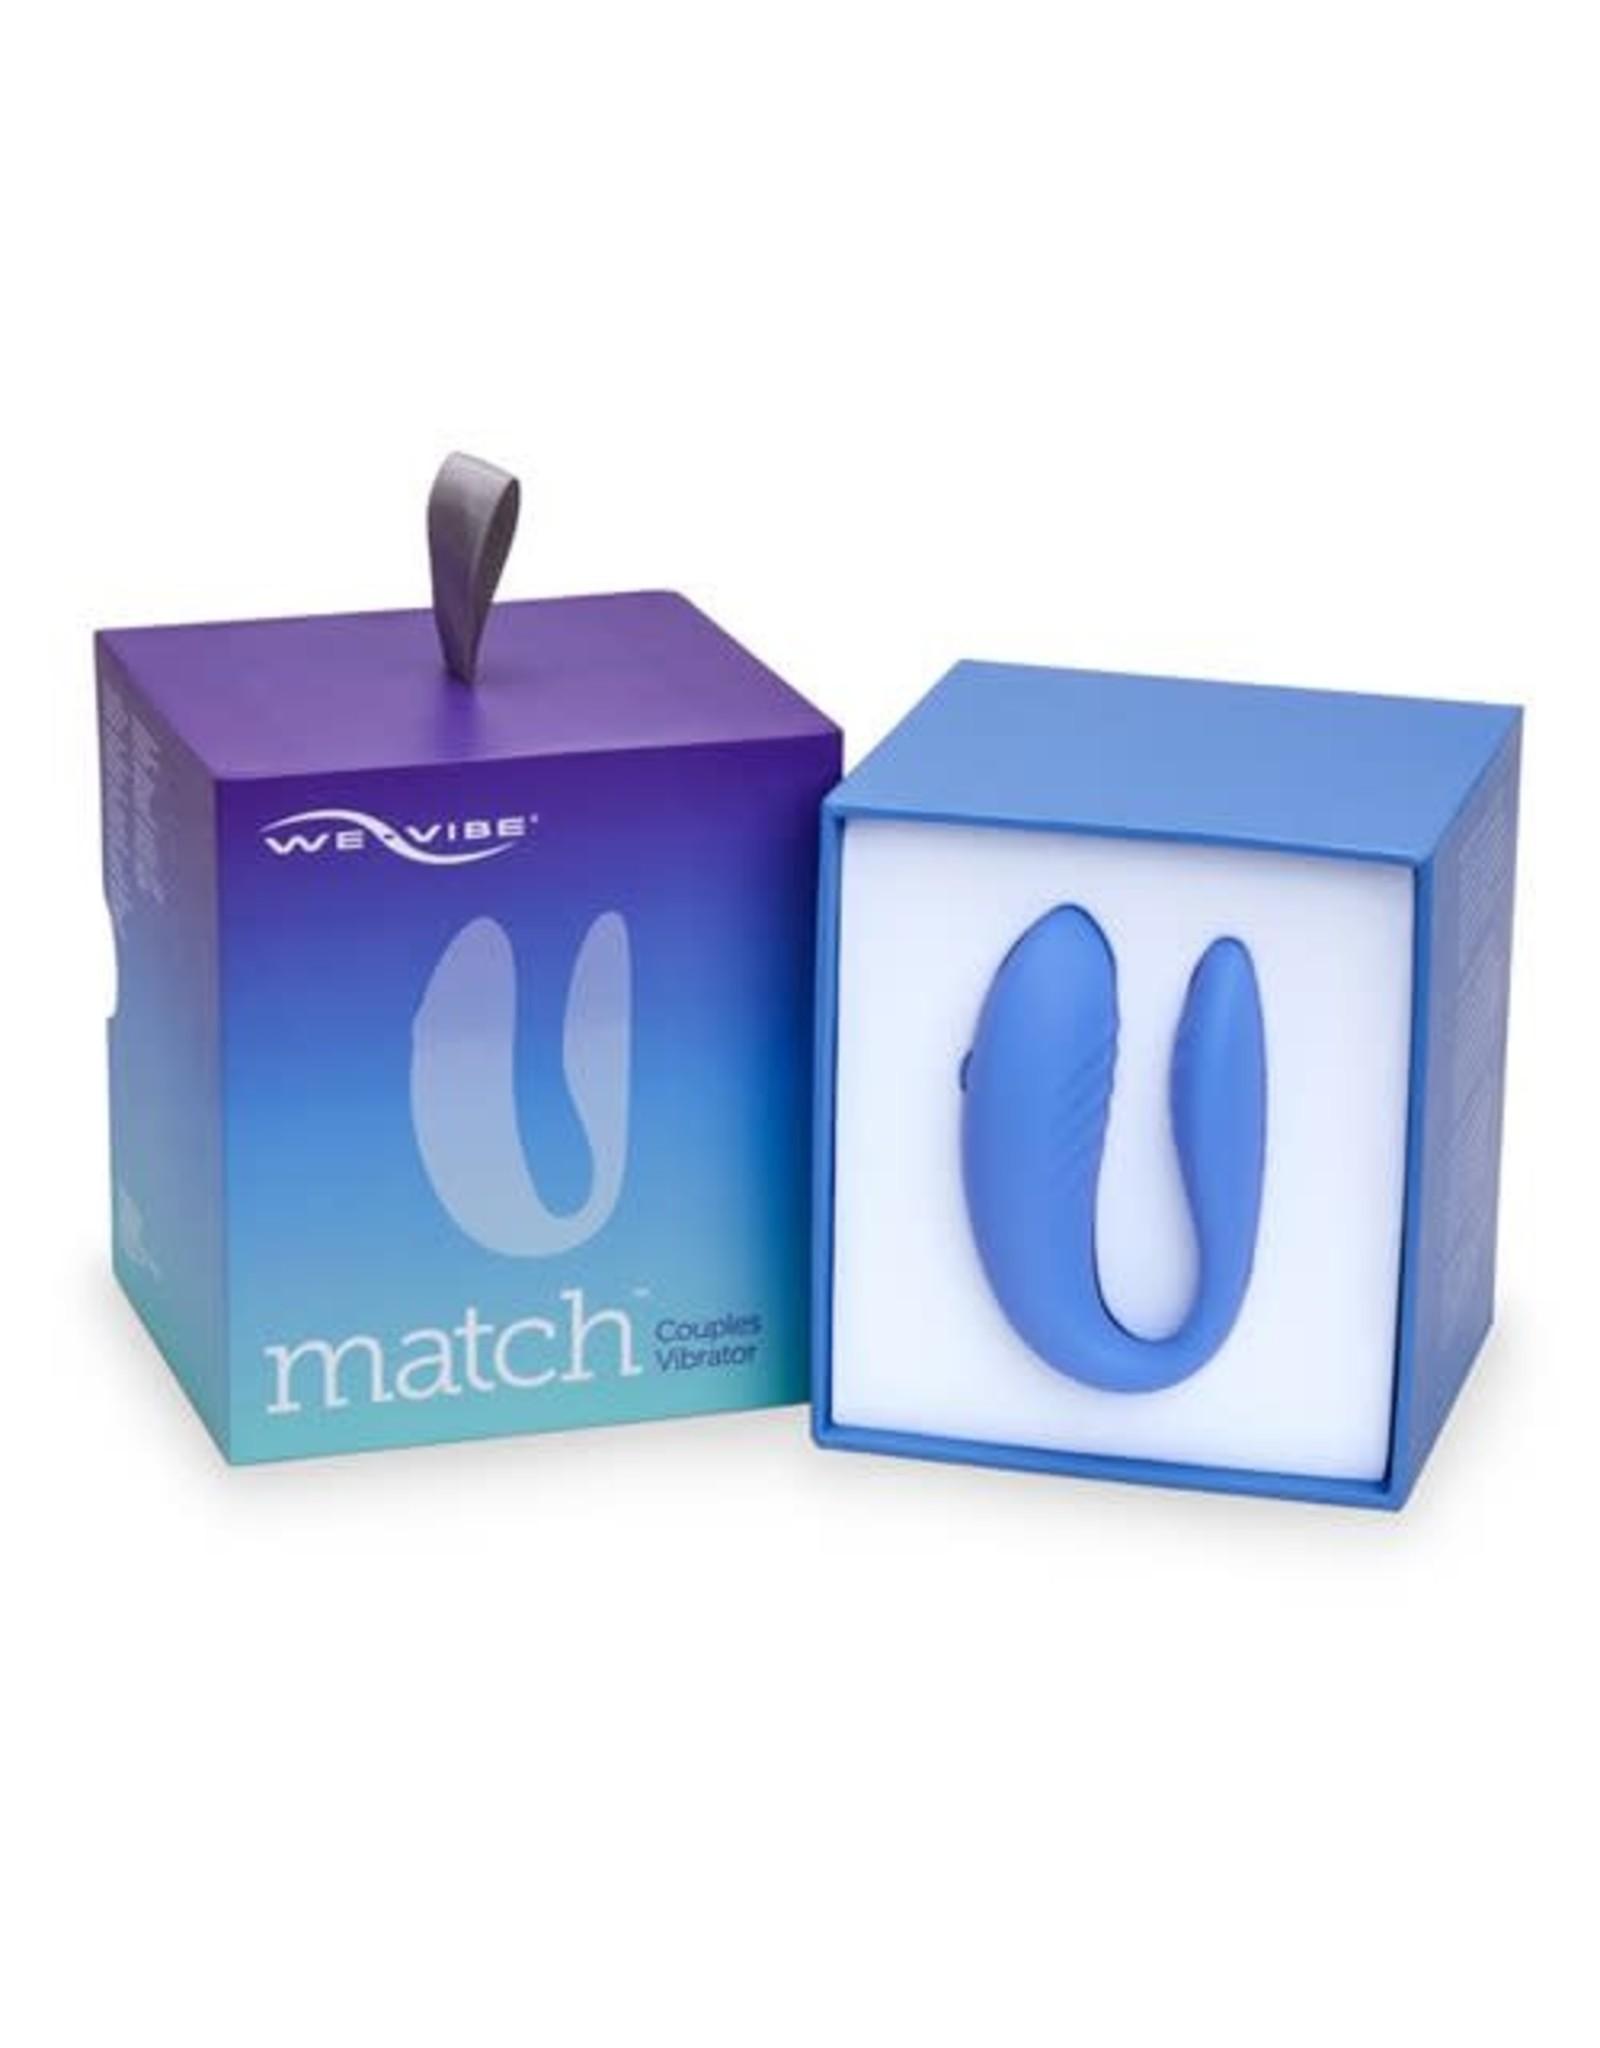 WE-VIBE We-Vibe Match (Blue)